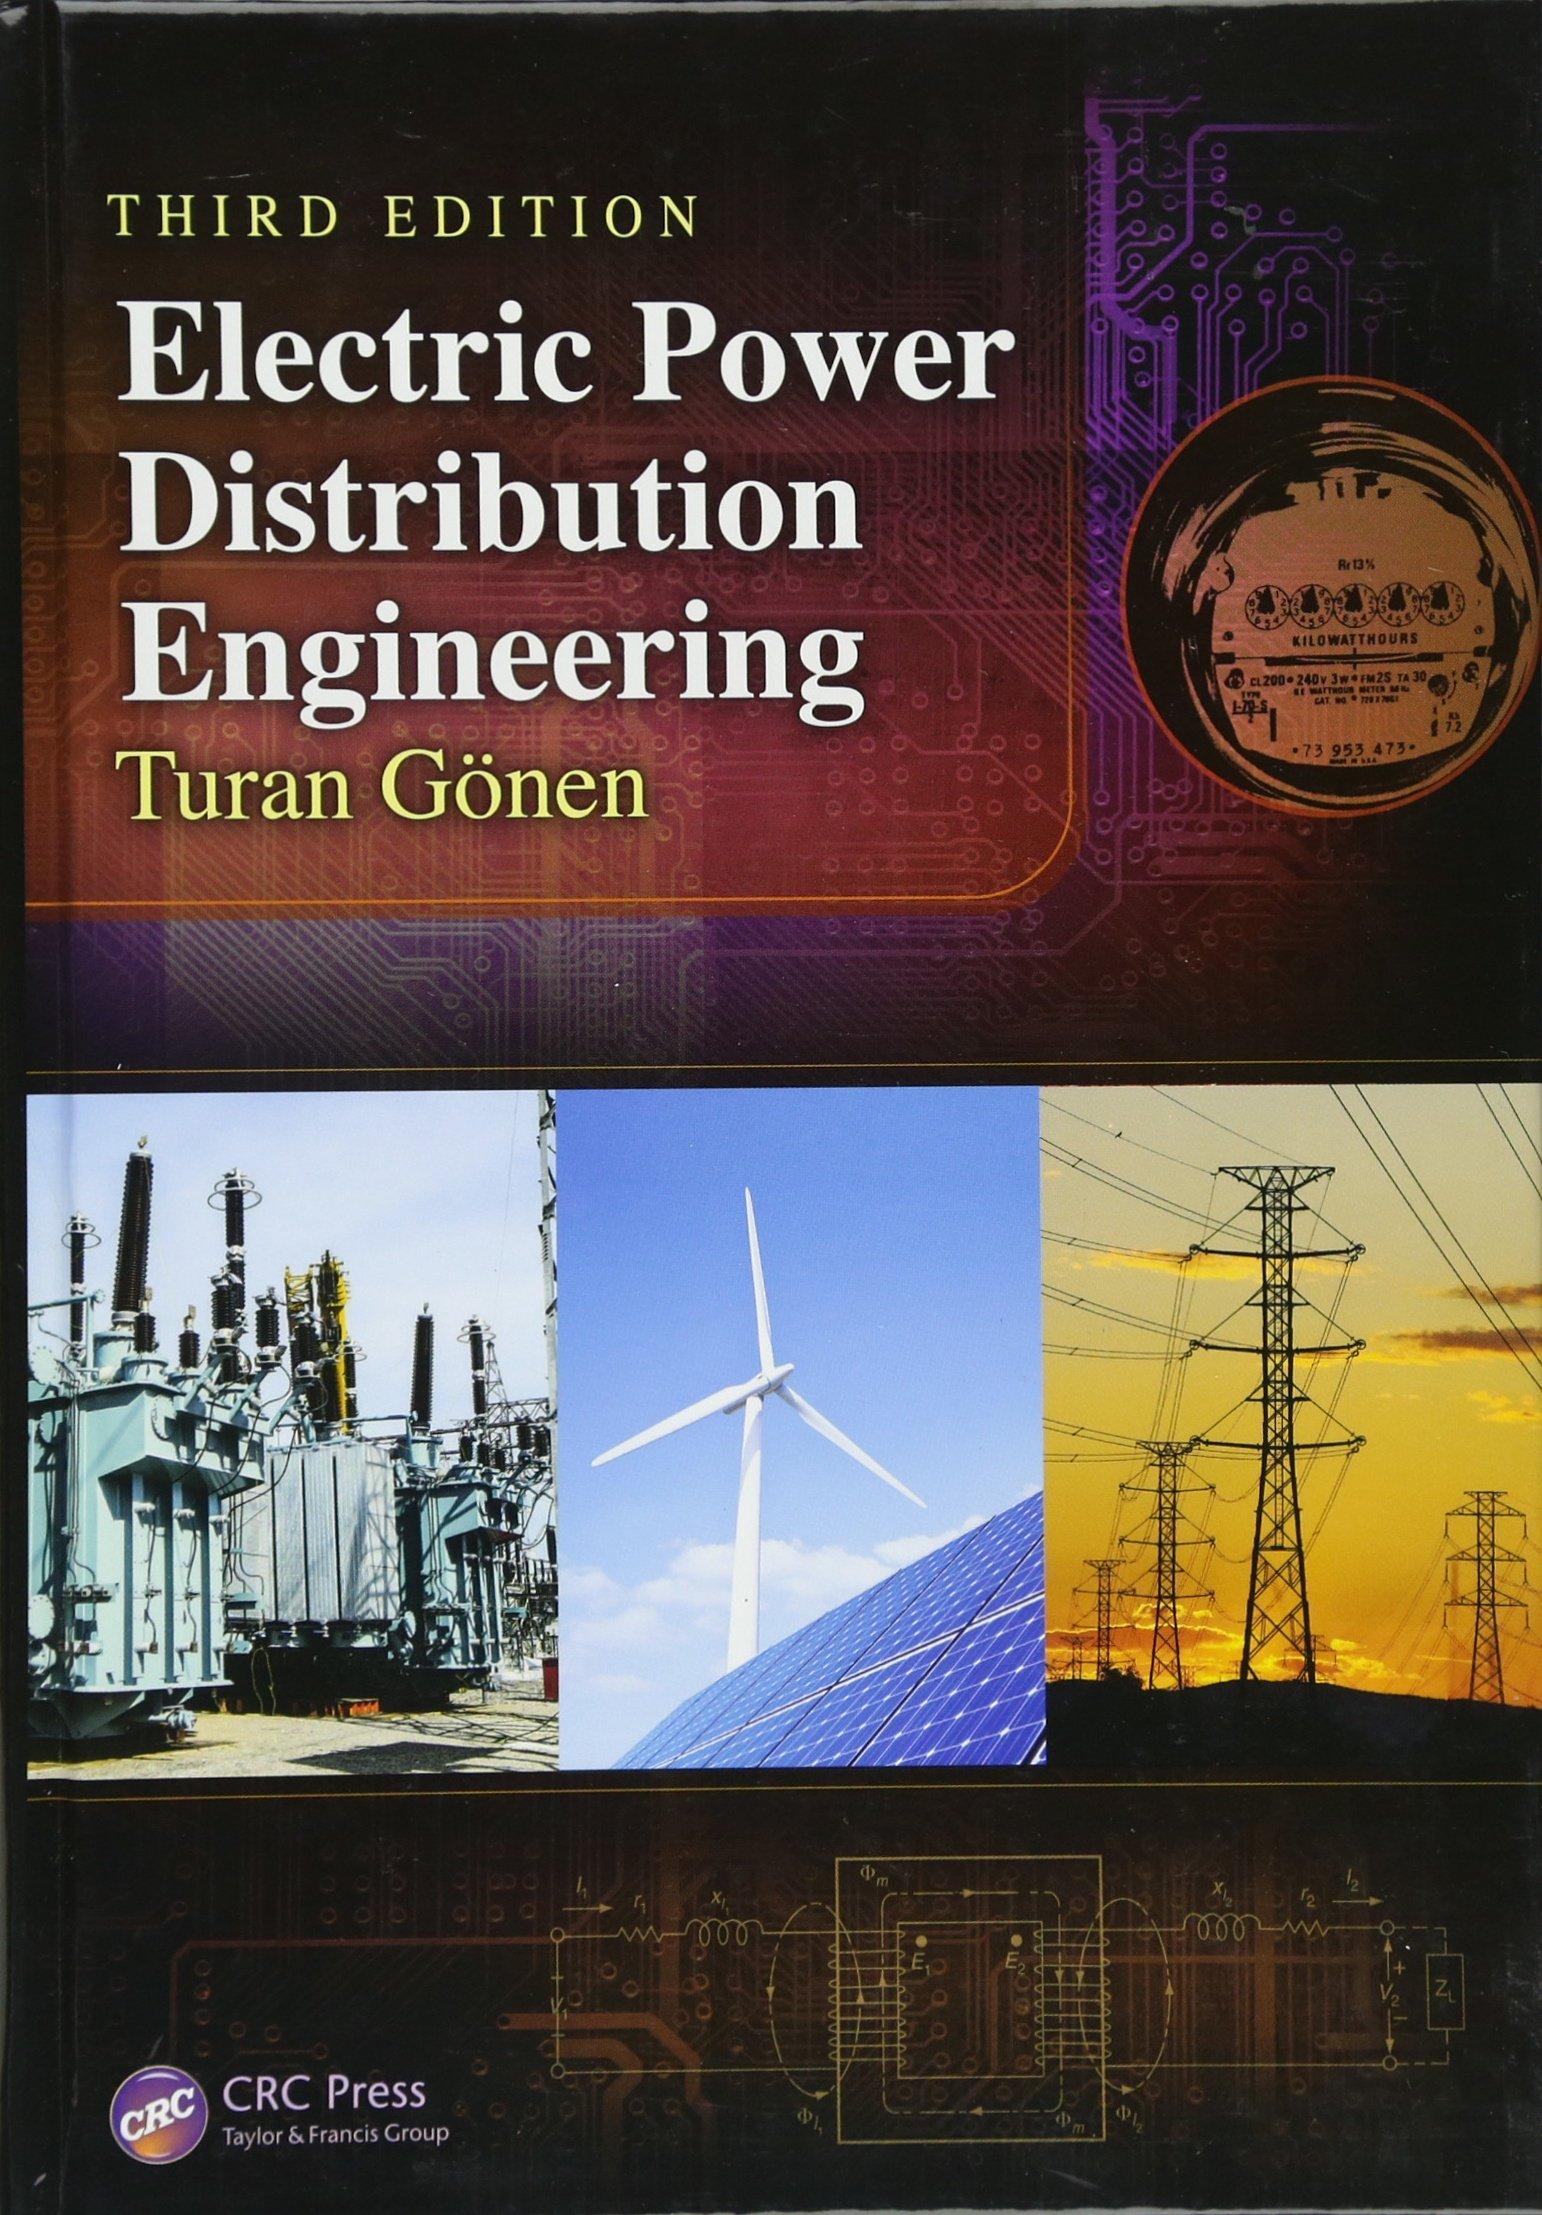 amazon electric power distribution engineering turan gonen